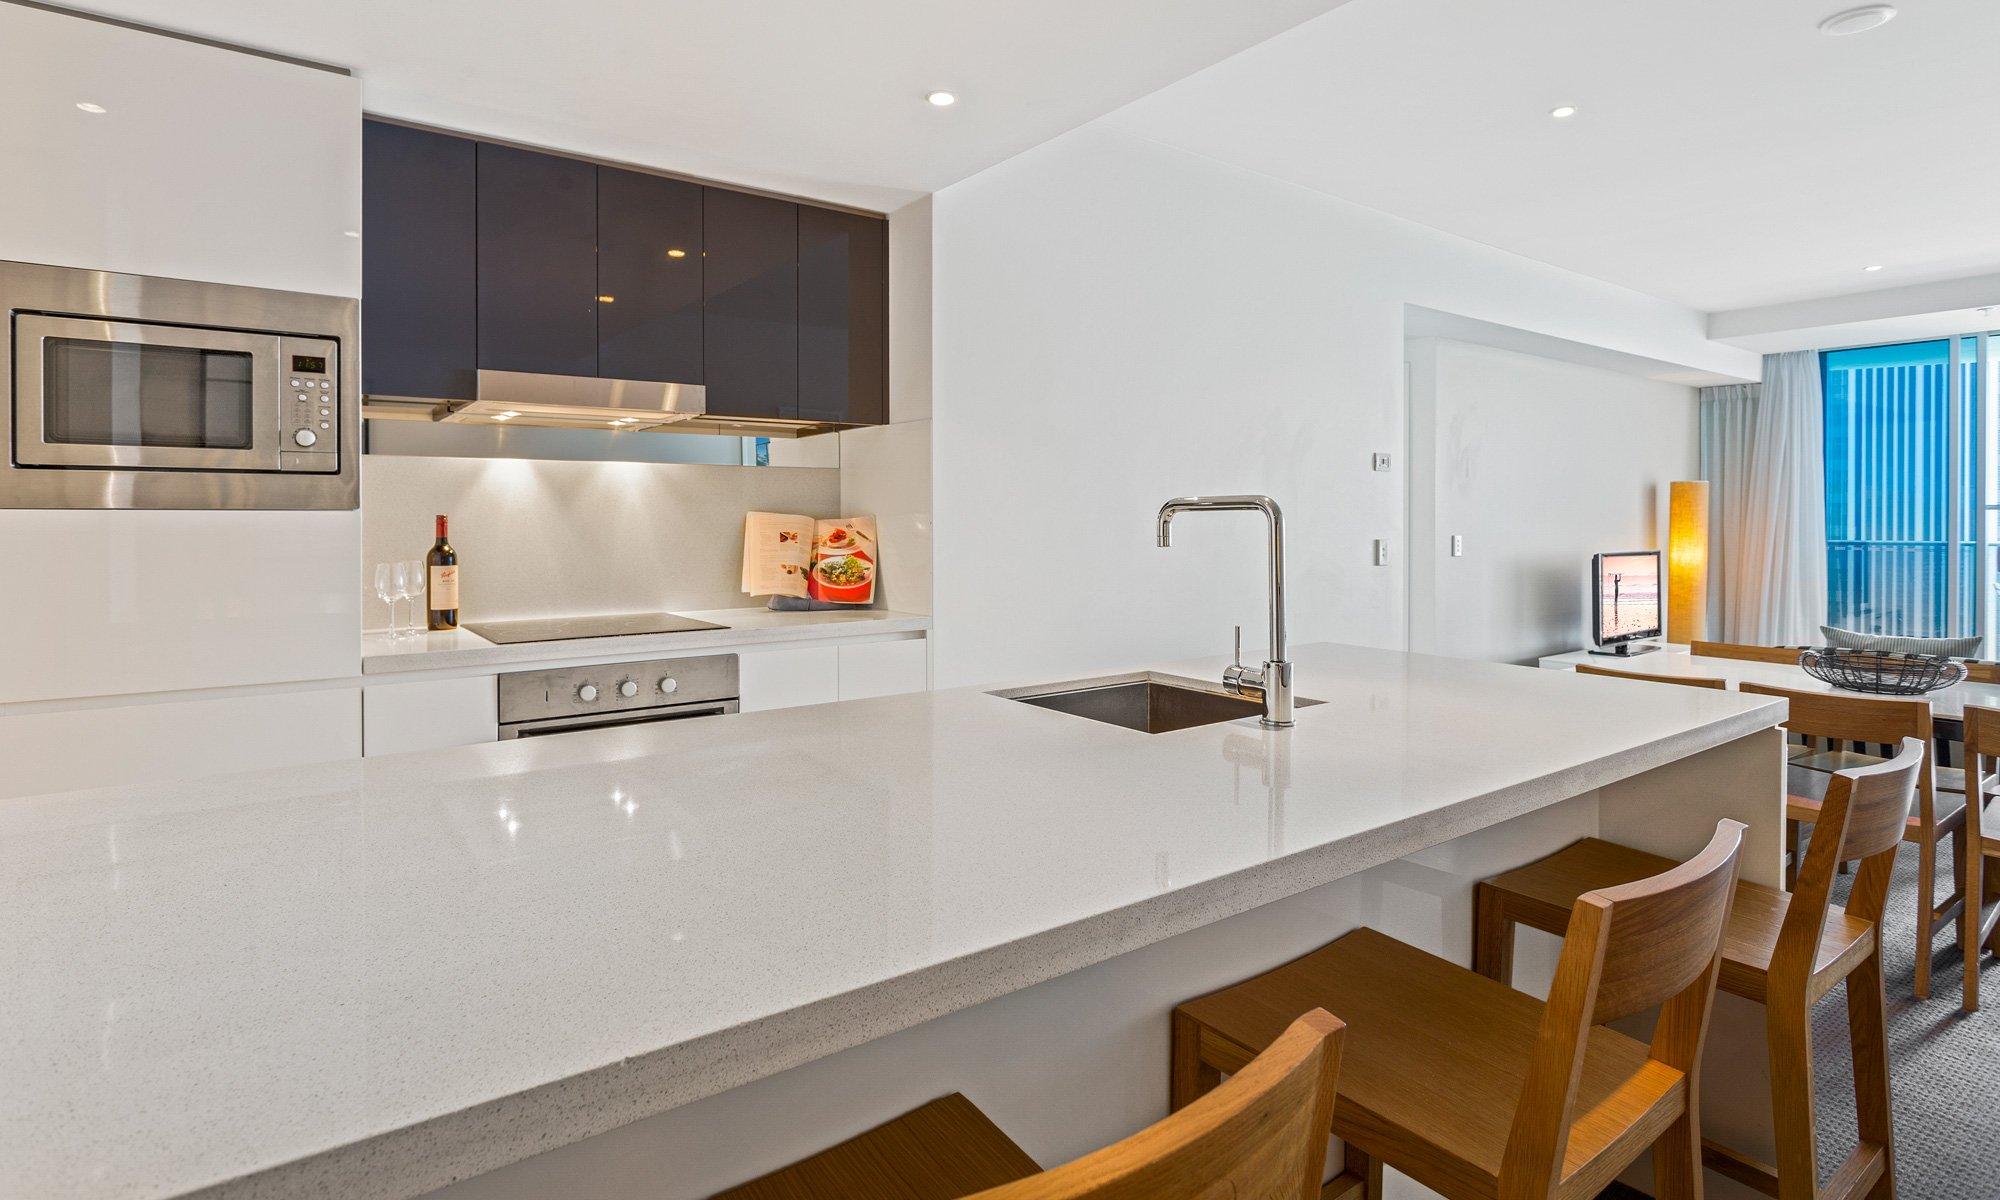 Gold Coast real estate for rent H Residences 21903 above Hilton Surfers Paradise large kitchen